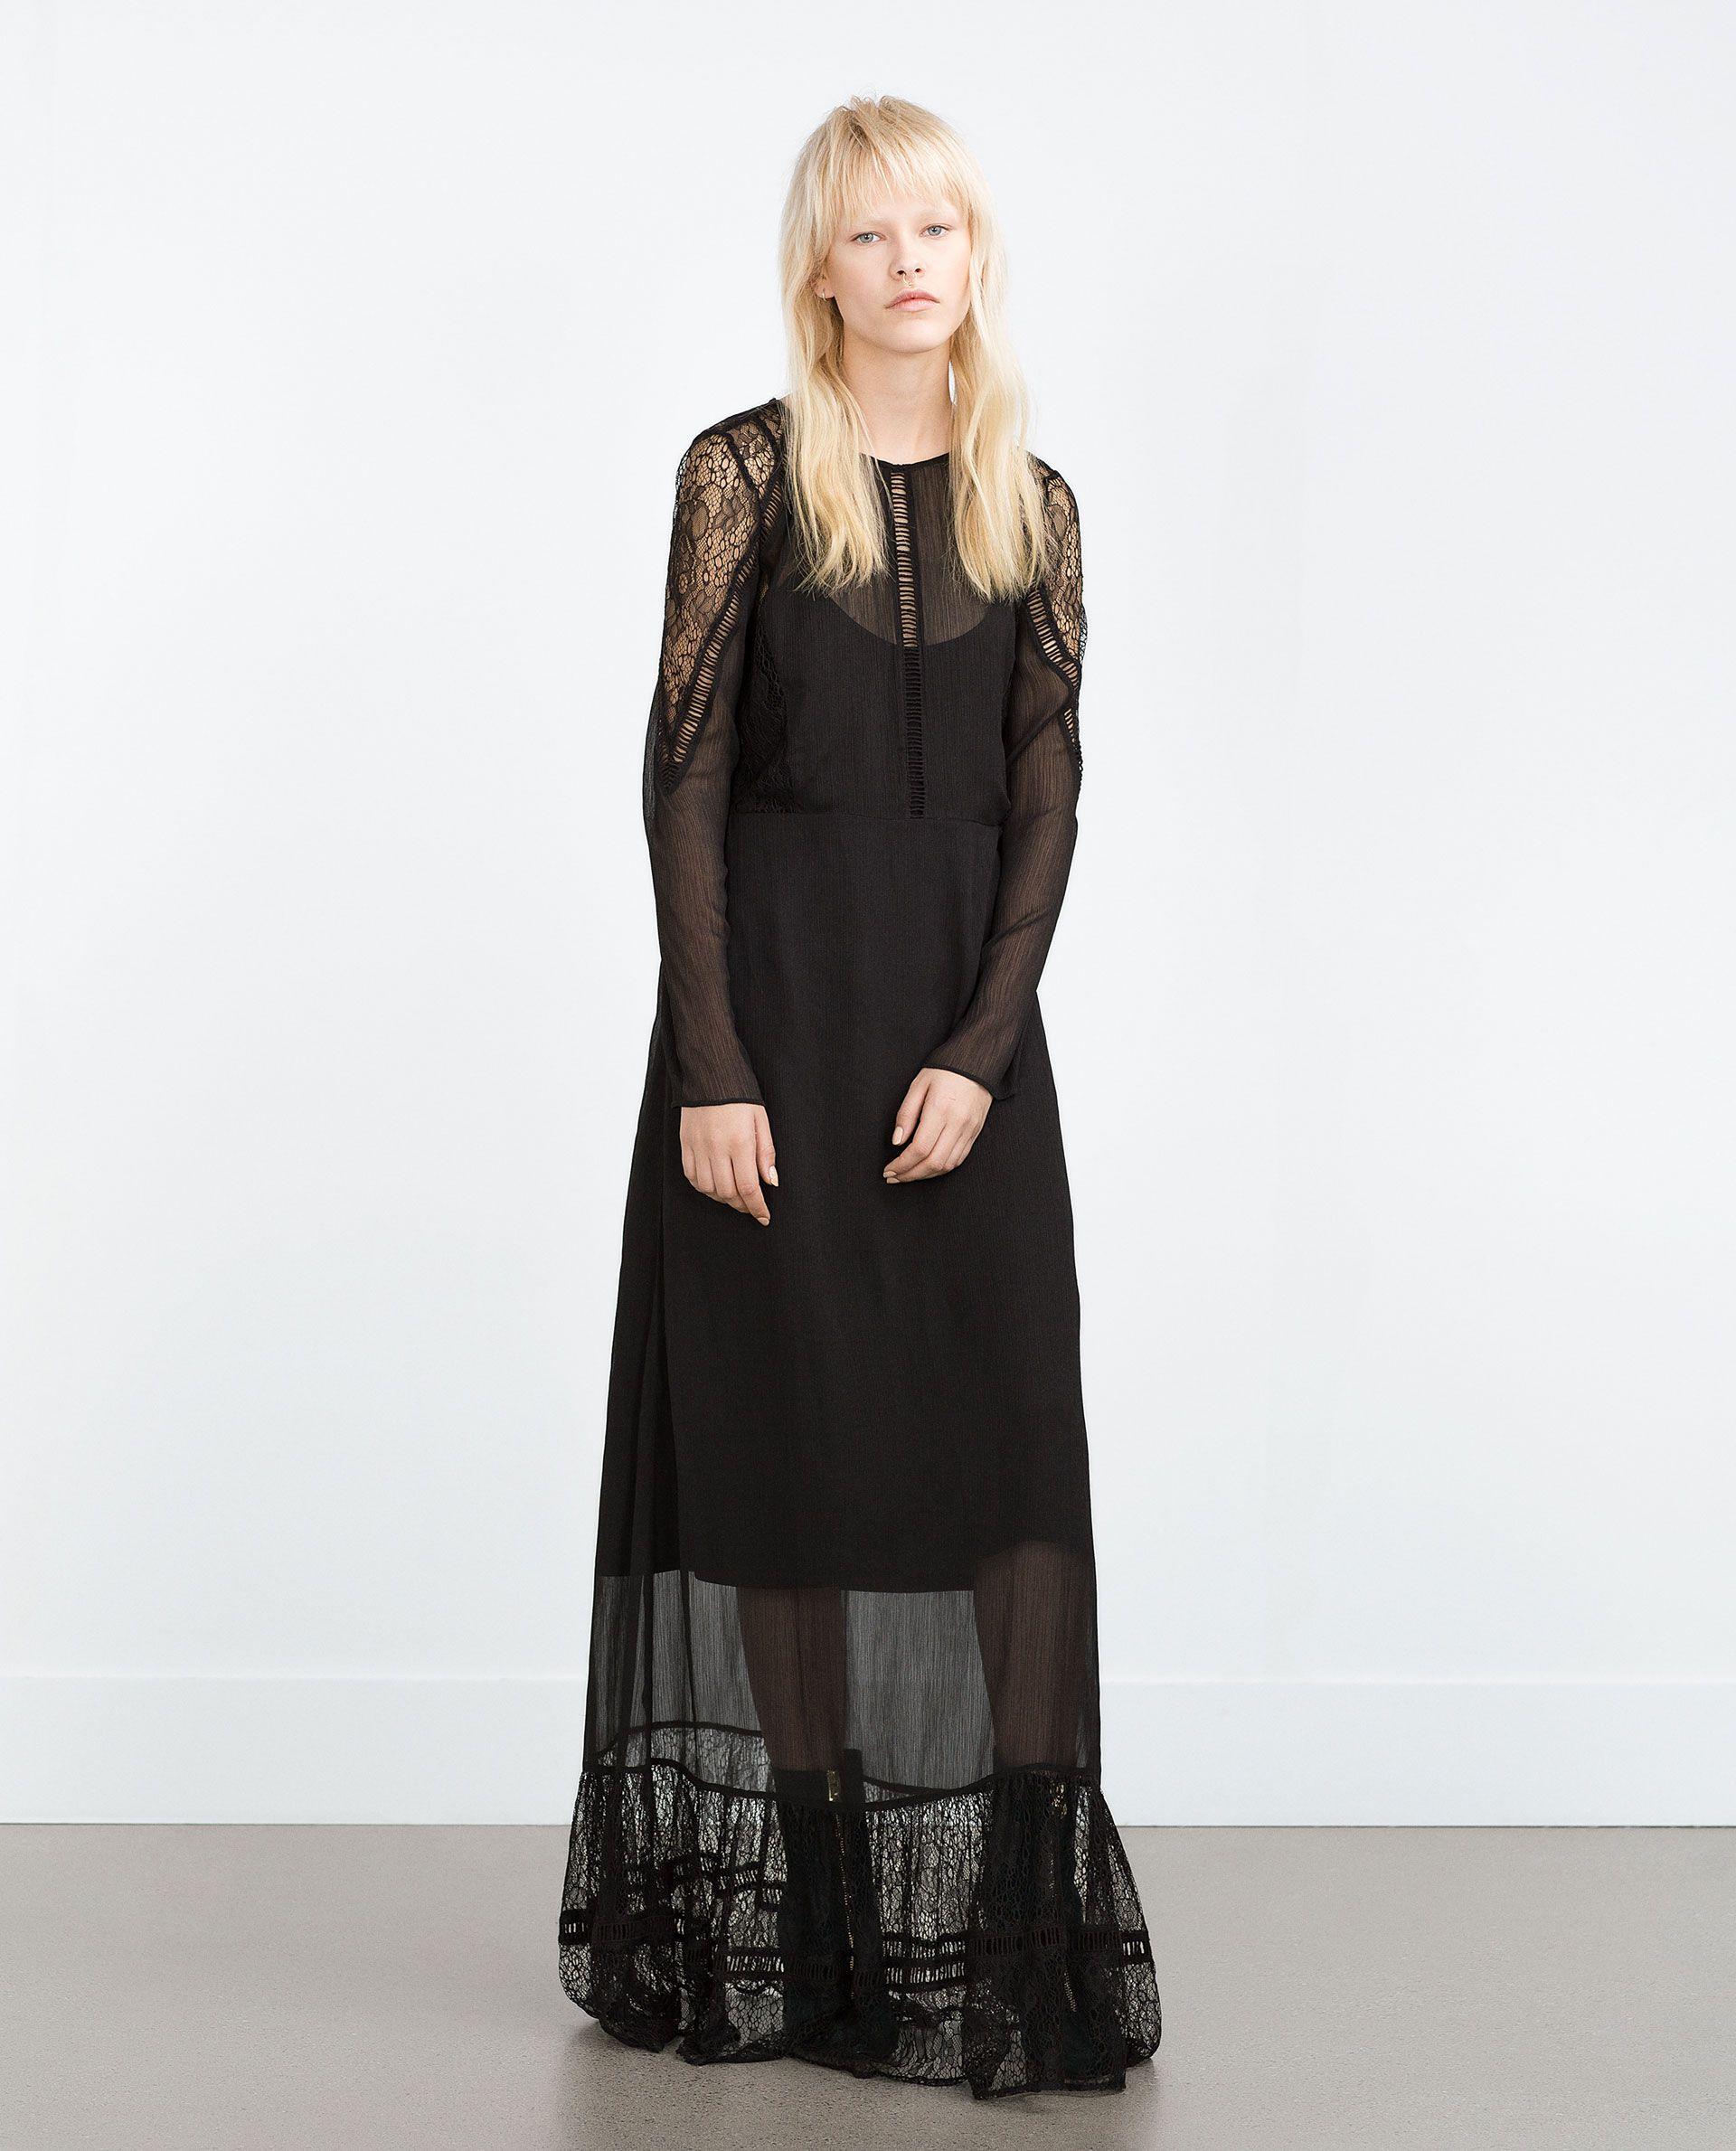 Long Lace Dress Dresses Trf Sheer Slip Dress Lace Dress Long Dresses